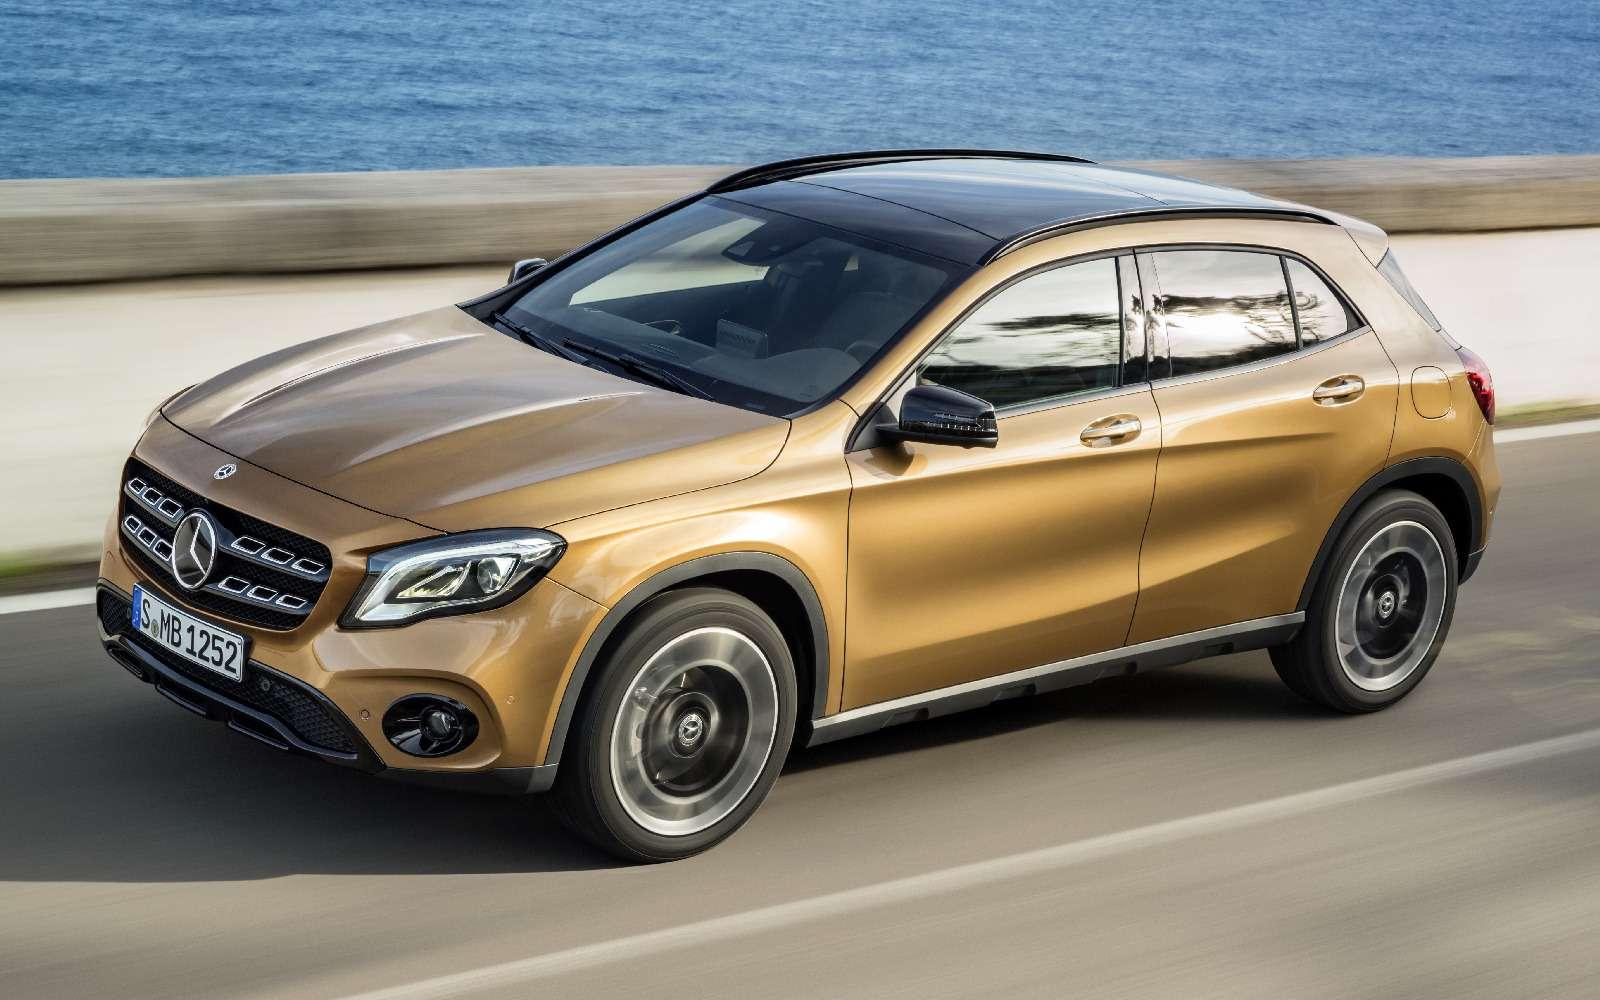 Mercedes-Benz GLA стал краше, нонепросторнее— фото 690070